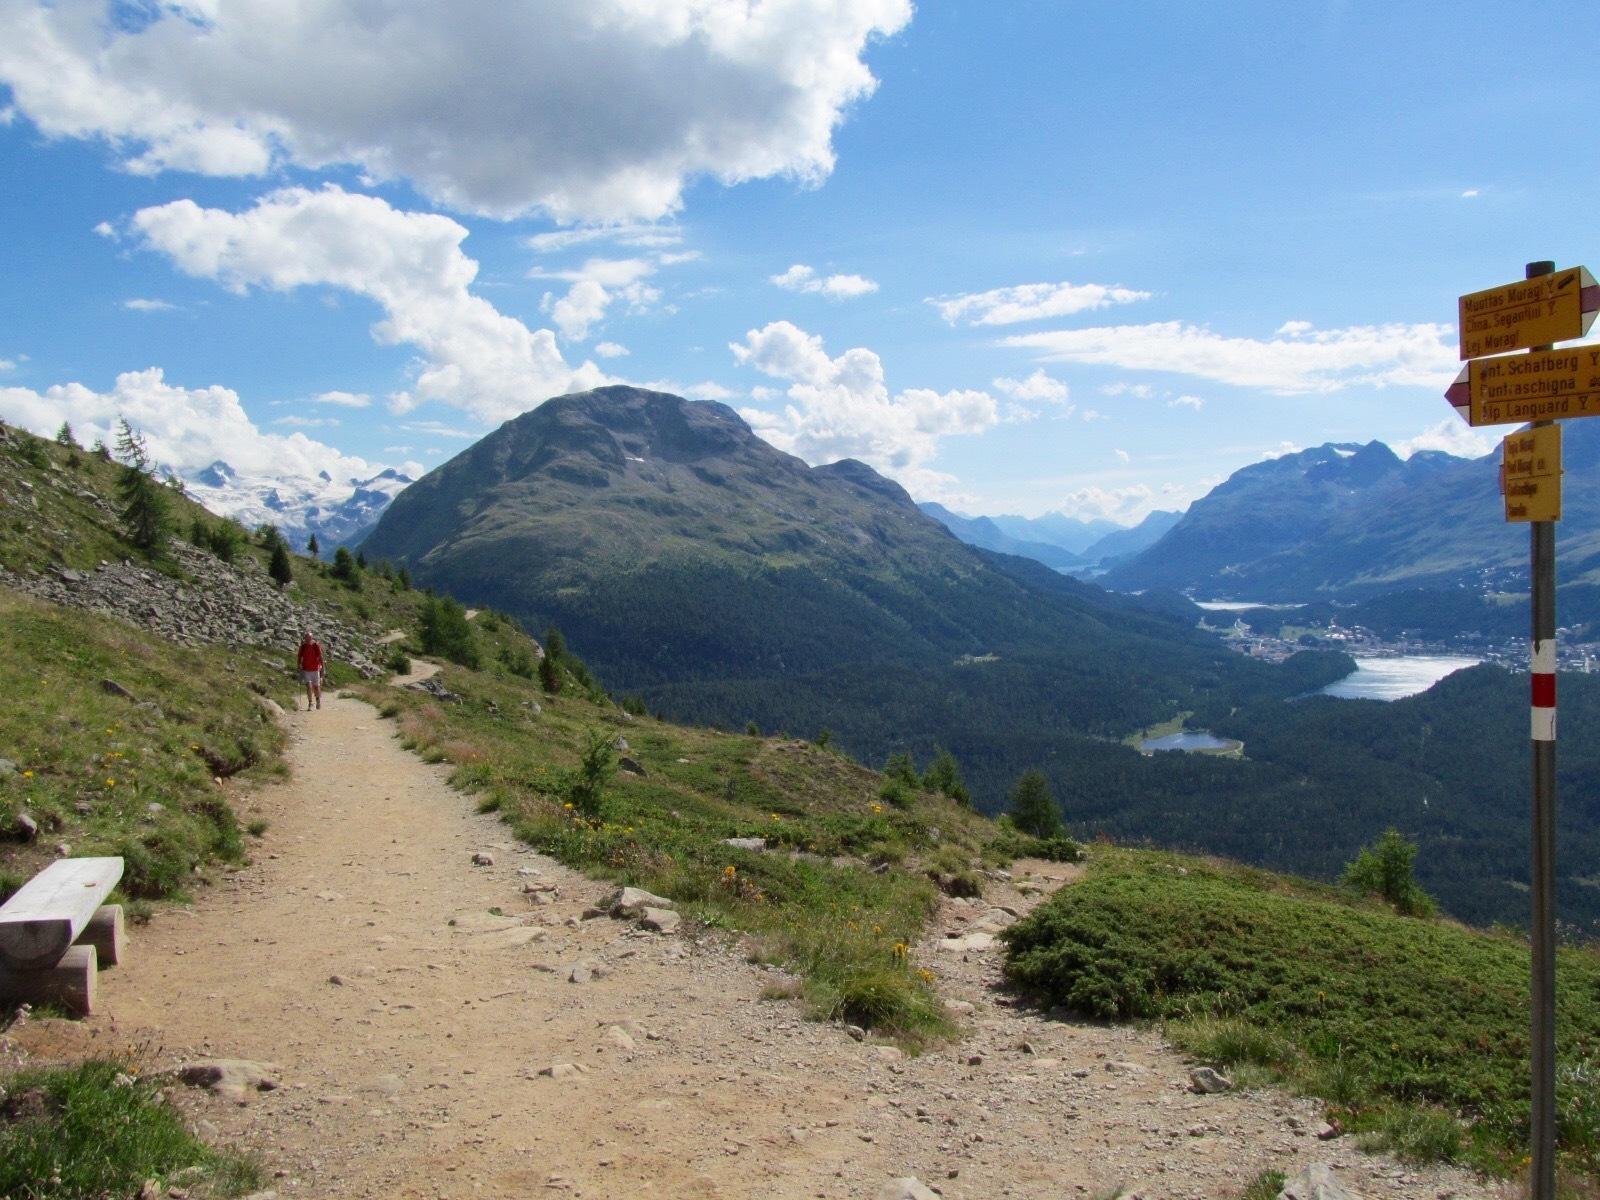 Sitzbänke Panoramaweg Muottas-Muragl - Alp Languard Slide 1